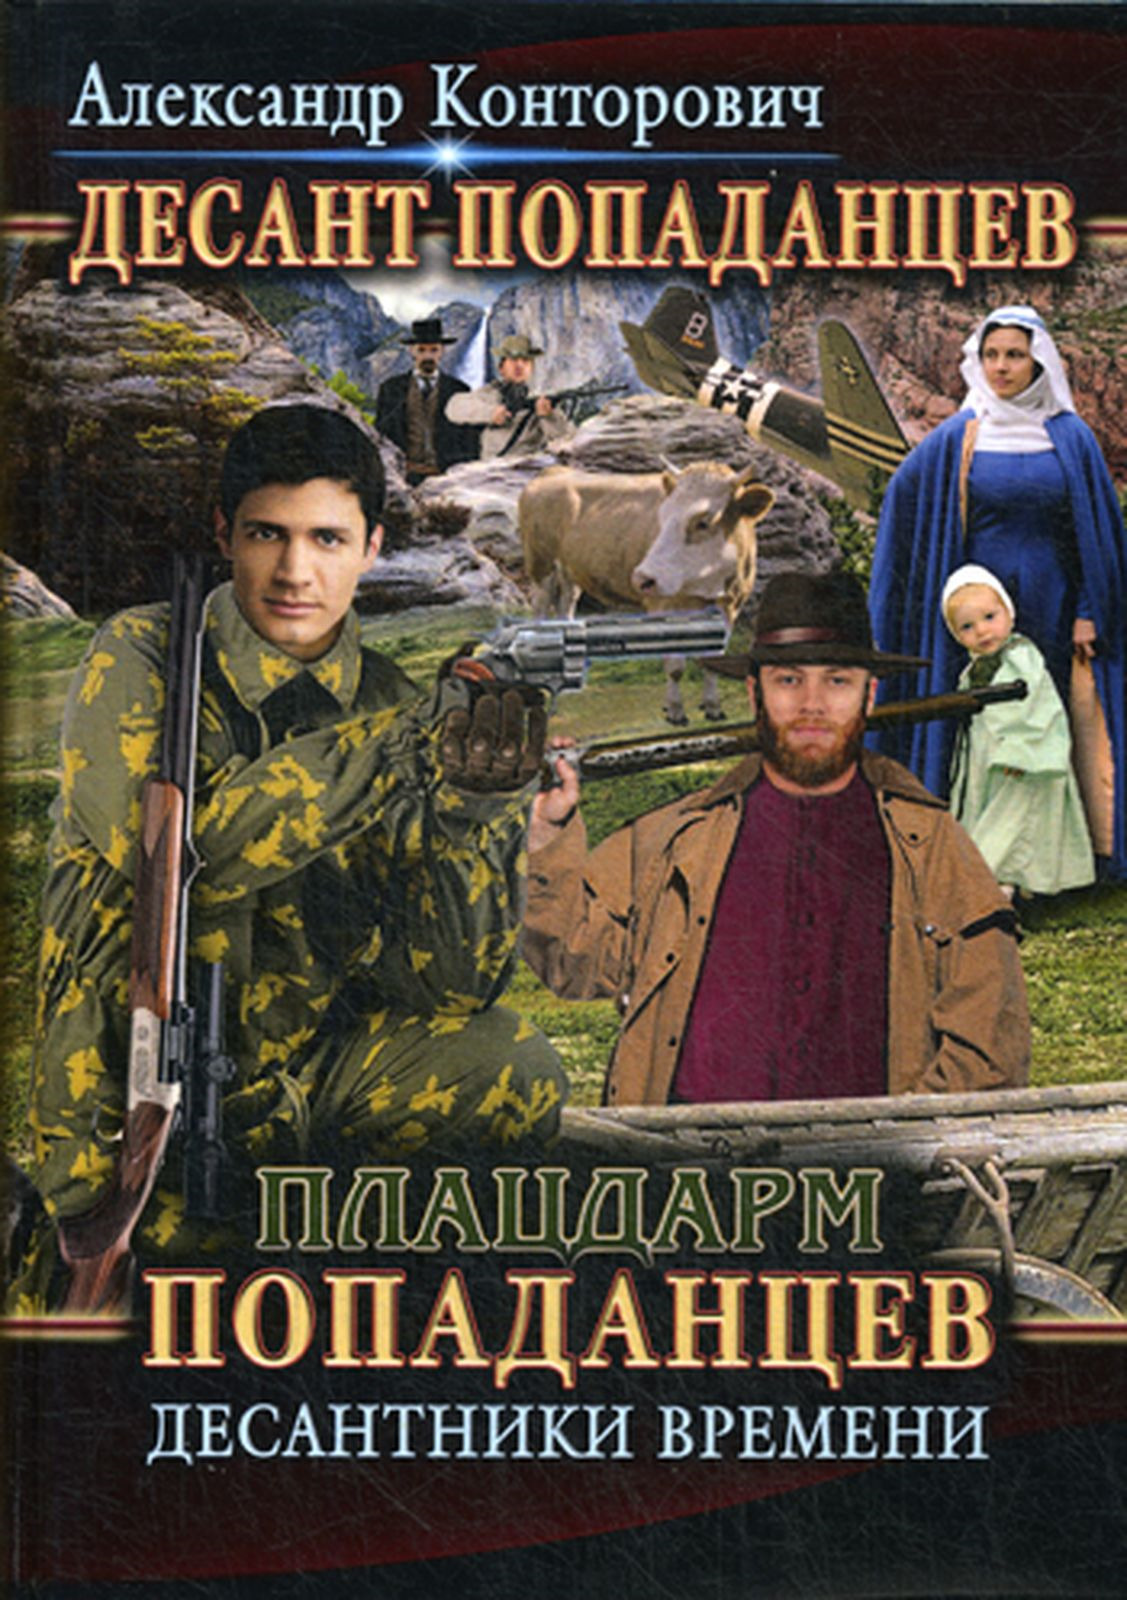 Александр Конторович Плацдарм попаданцев. Десантники времени. Книга 2